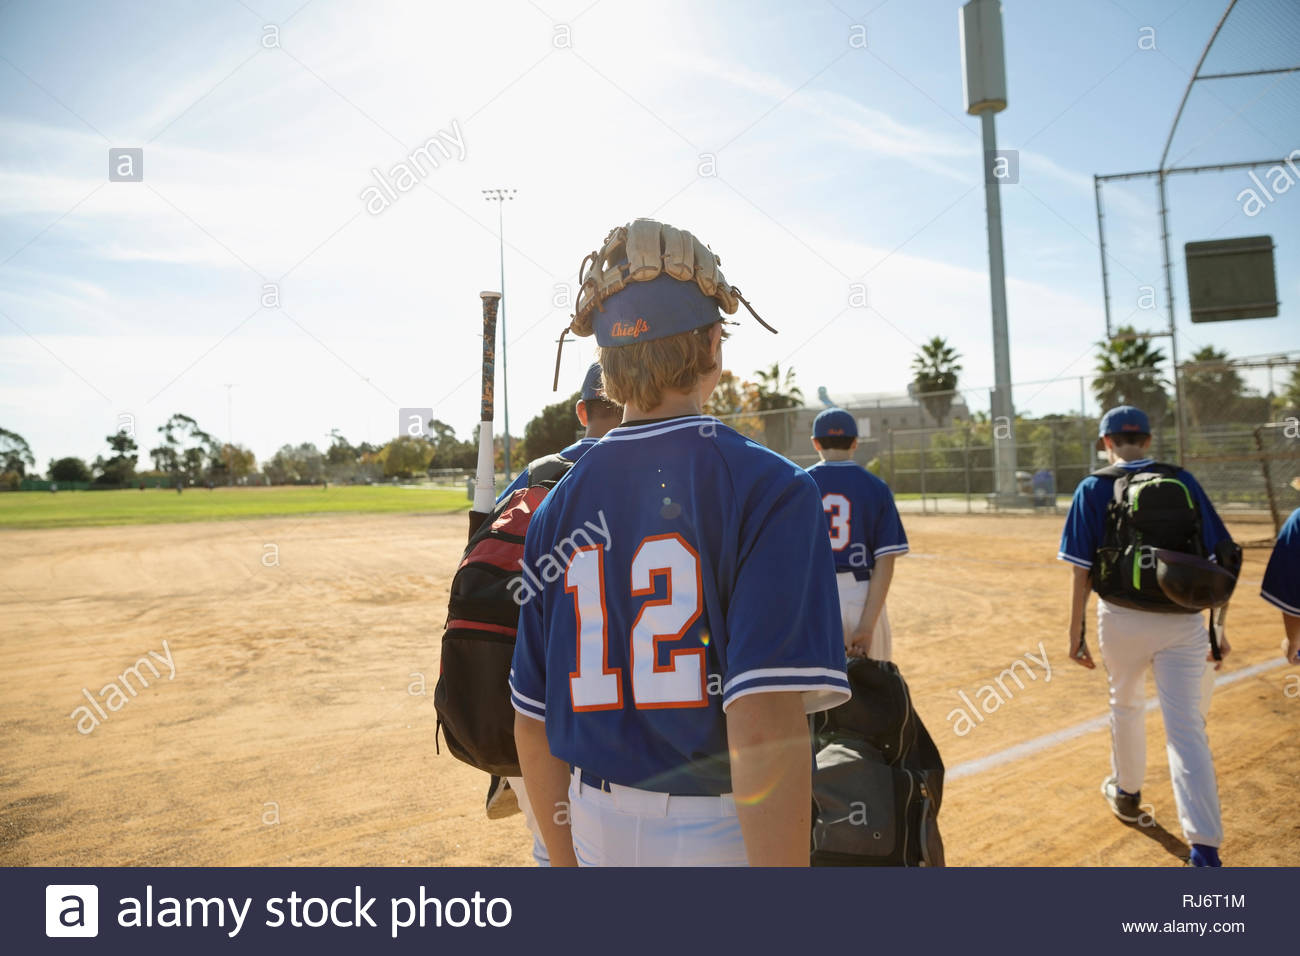 Baseball players walking off sunny field - Stock Image